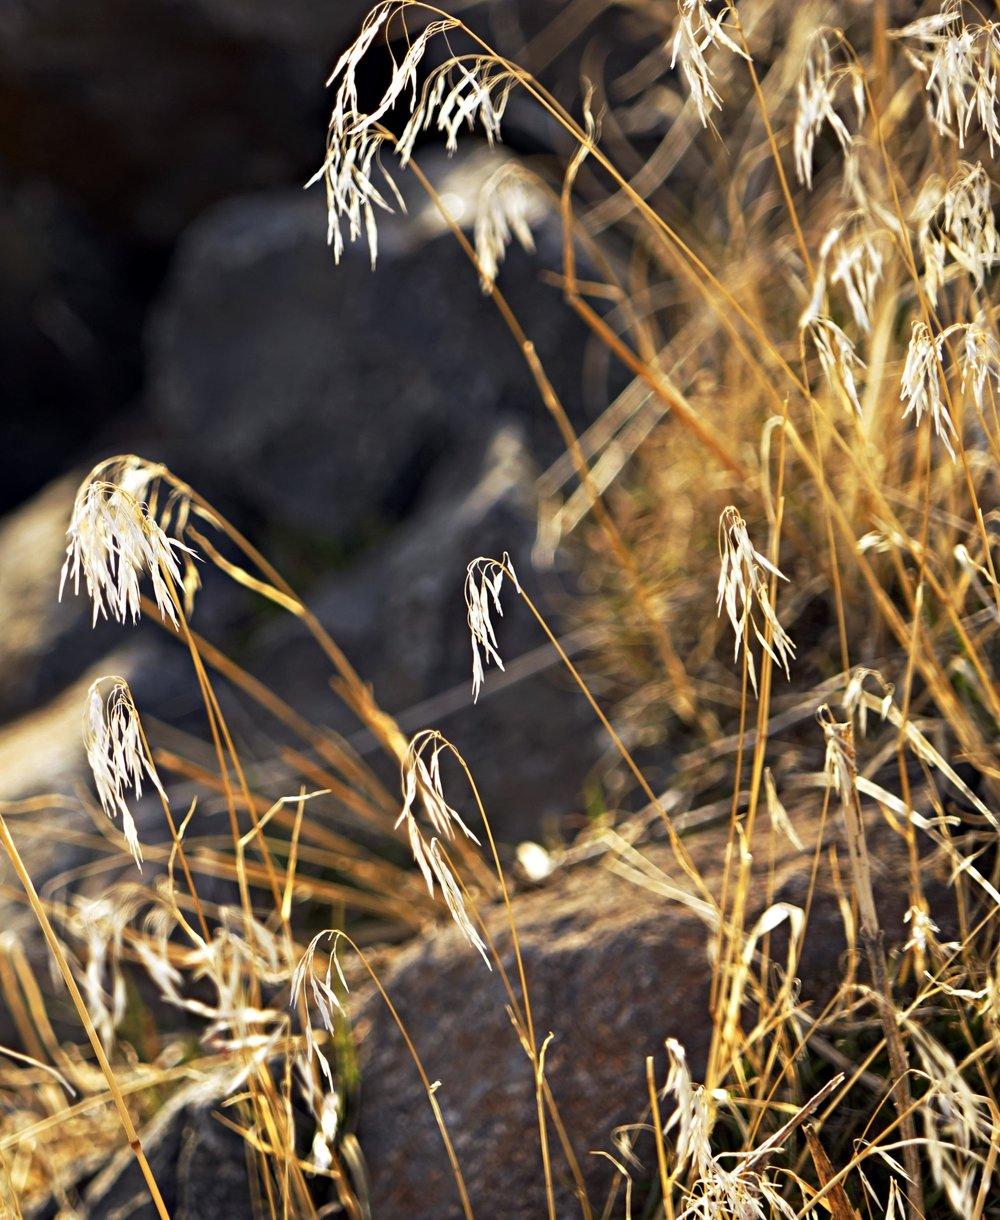 Cheatgrass (Bromus tectorum)